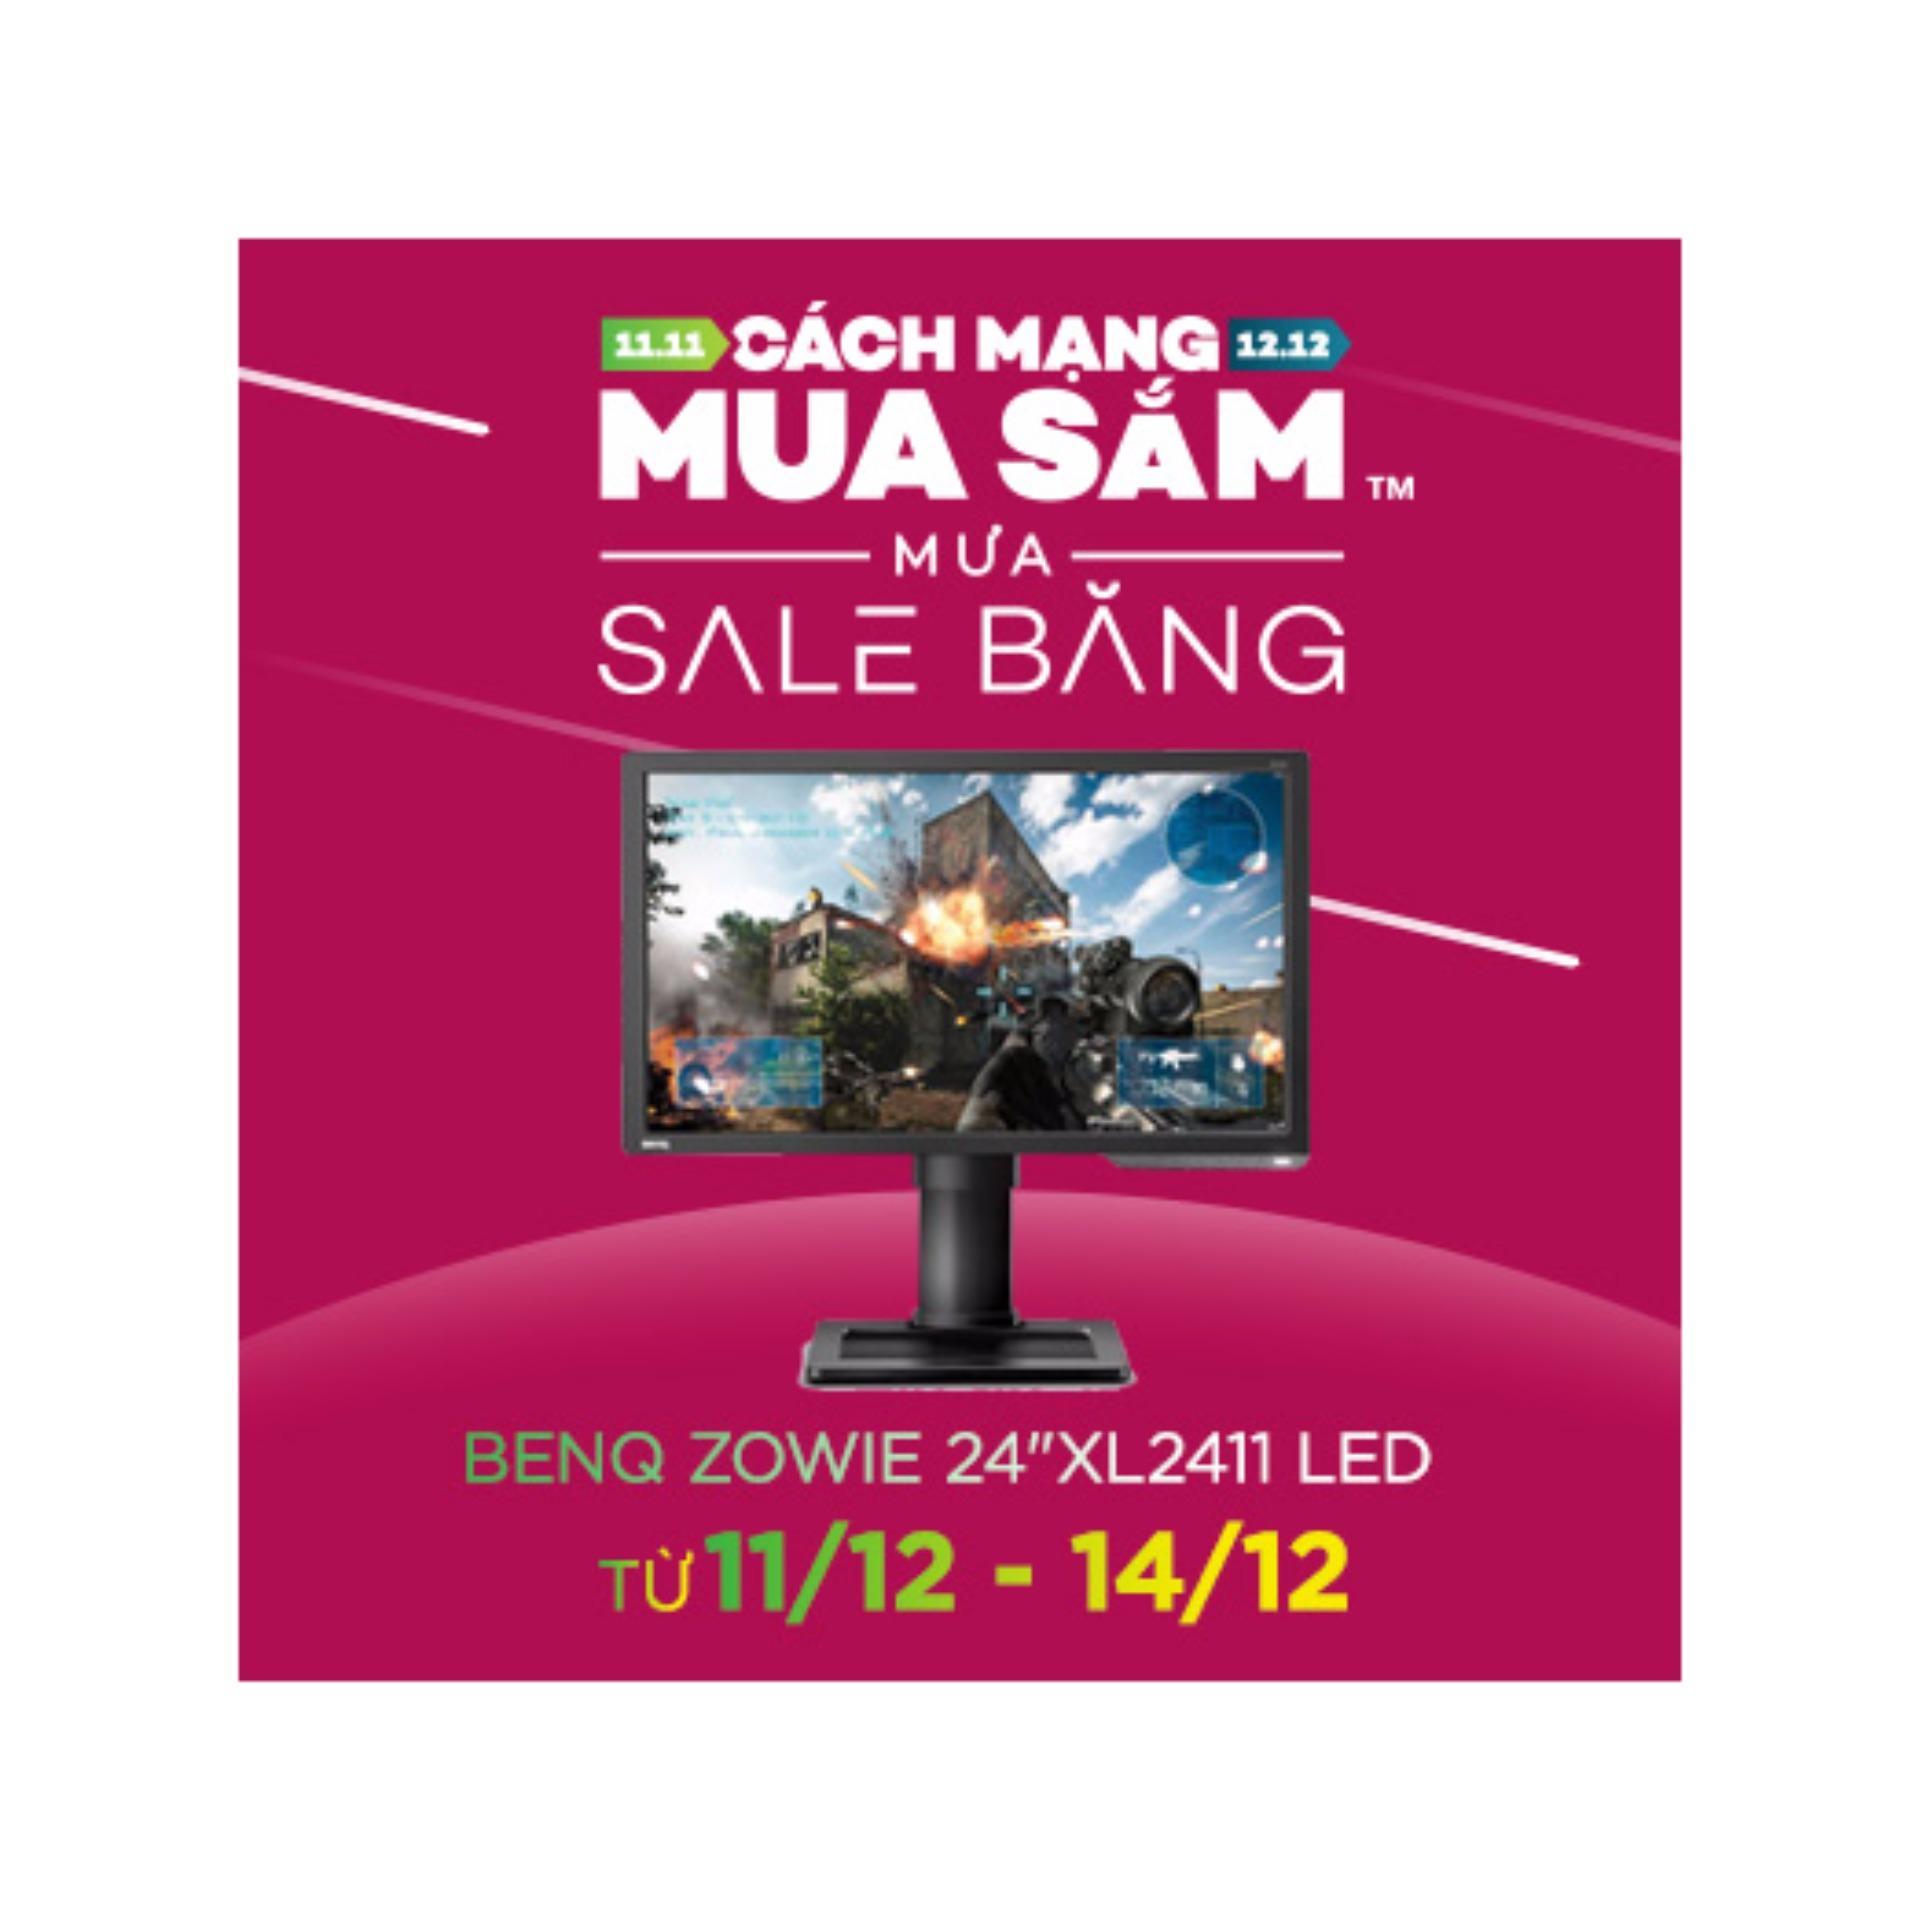 BenQ Zowie 24″XL2411 LED Gaming